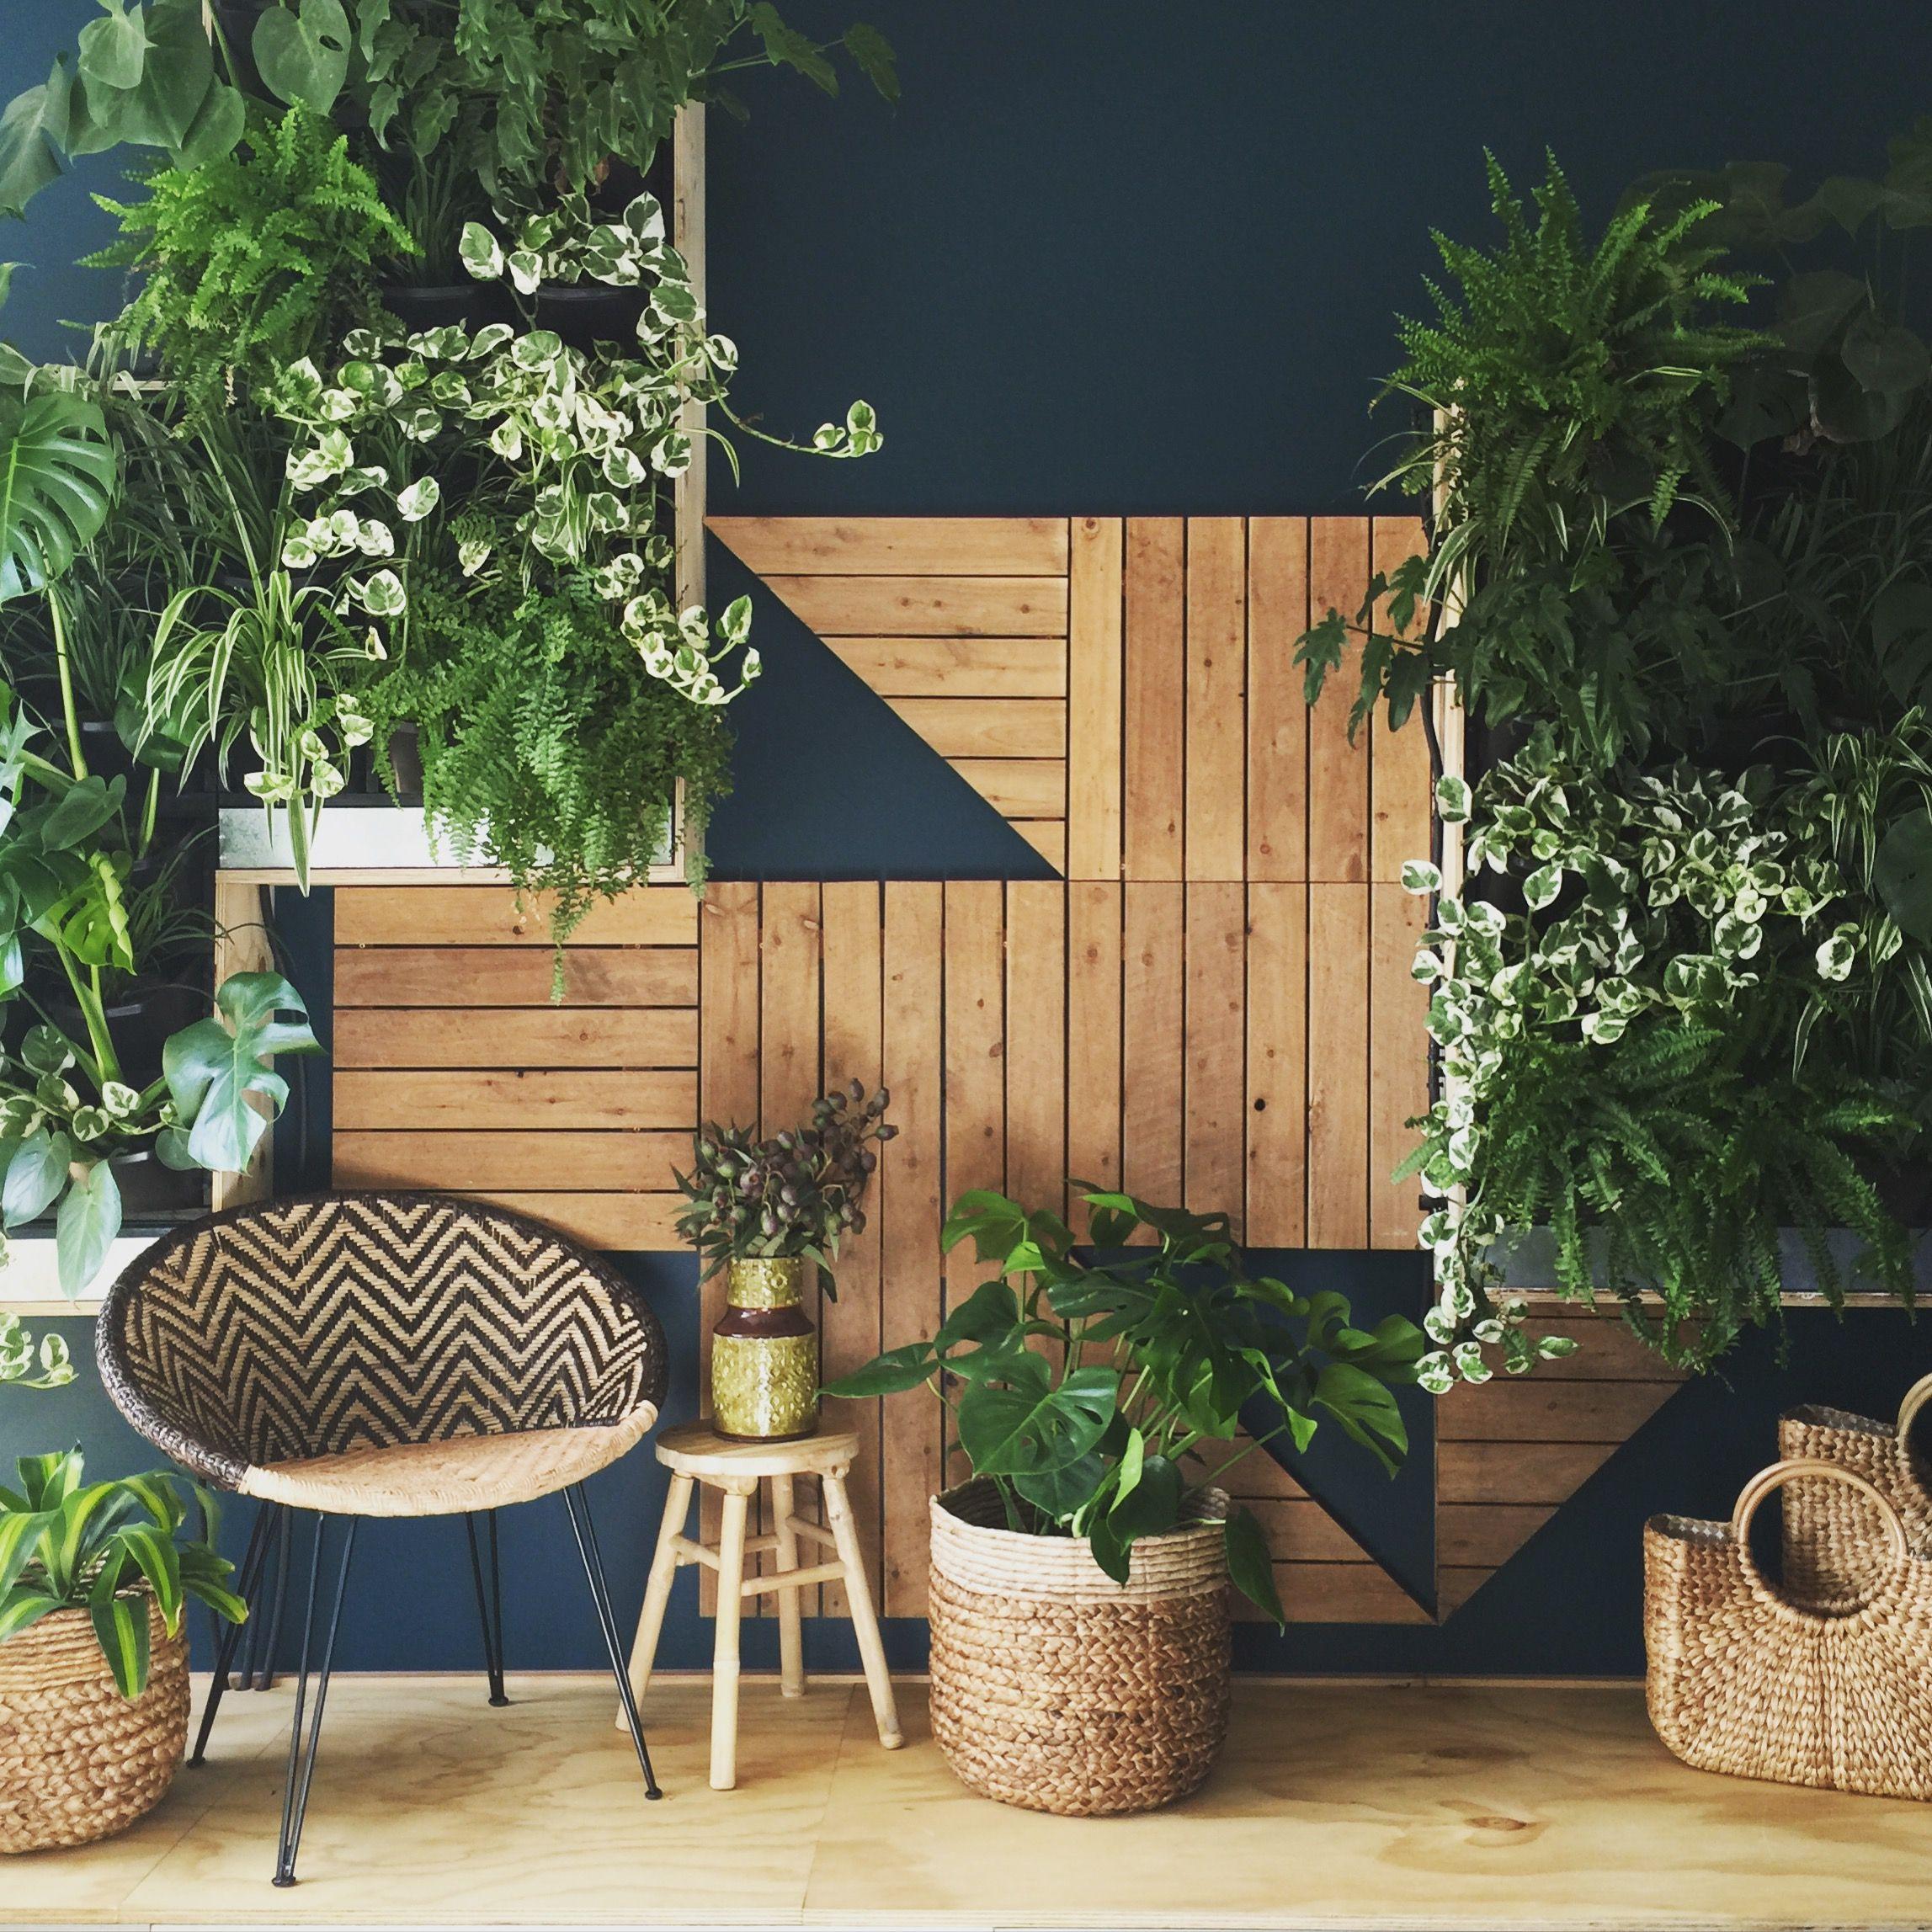 Garten Ambiente Luxus Our Stunning Phillip withers Vertical Garden is A Show